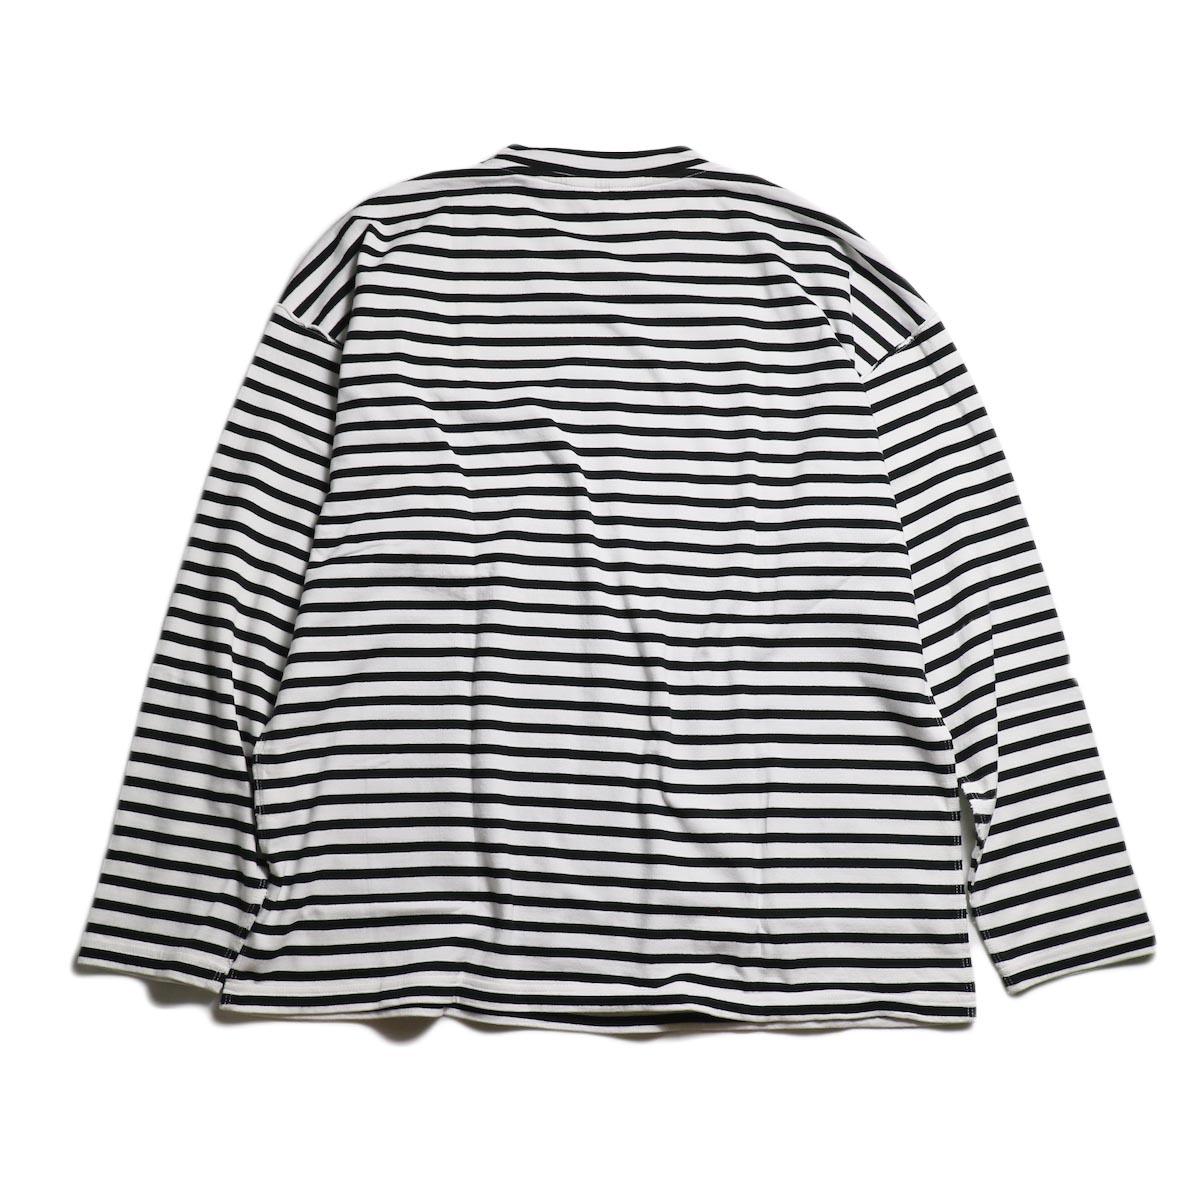 UNUSED / US1682 Long Sleeve Border T-Shirt -White/Black 背面